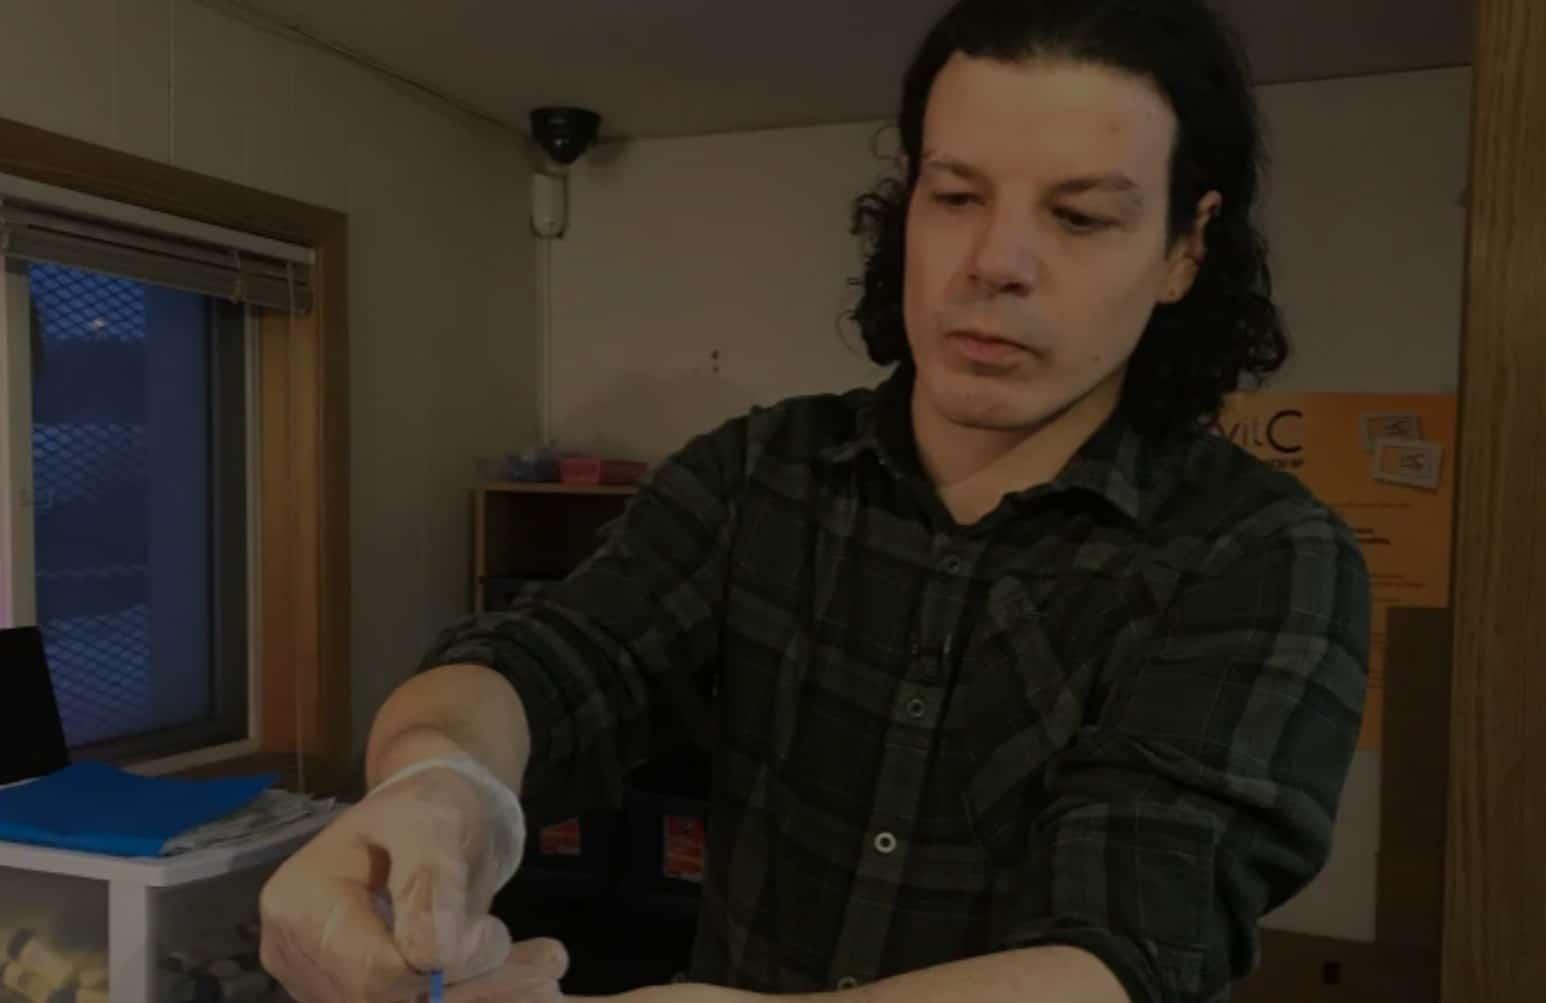 Harm reduction worker Jesse Whelan testing a sample of drugs